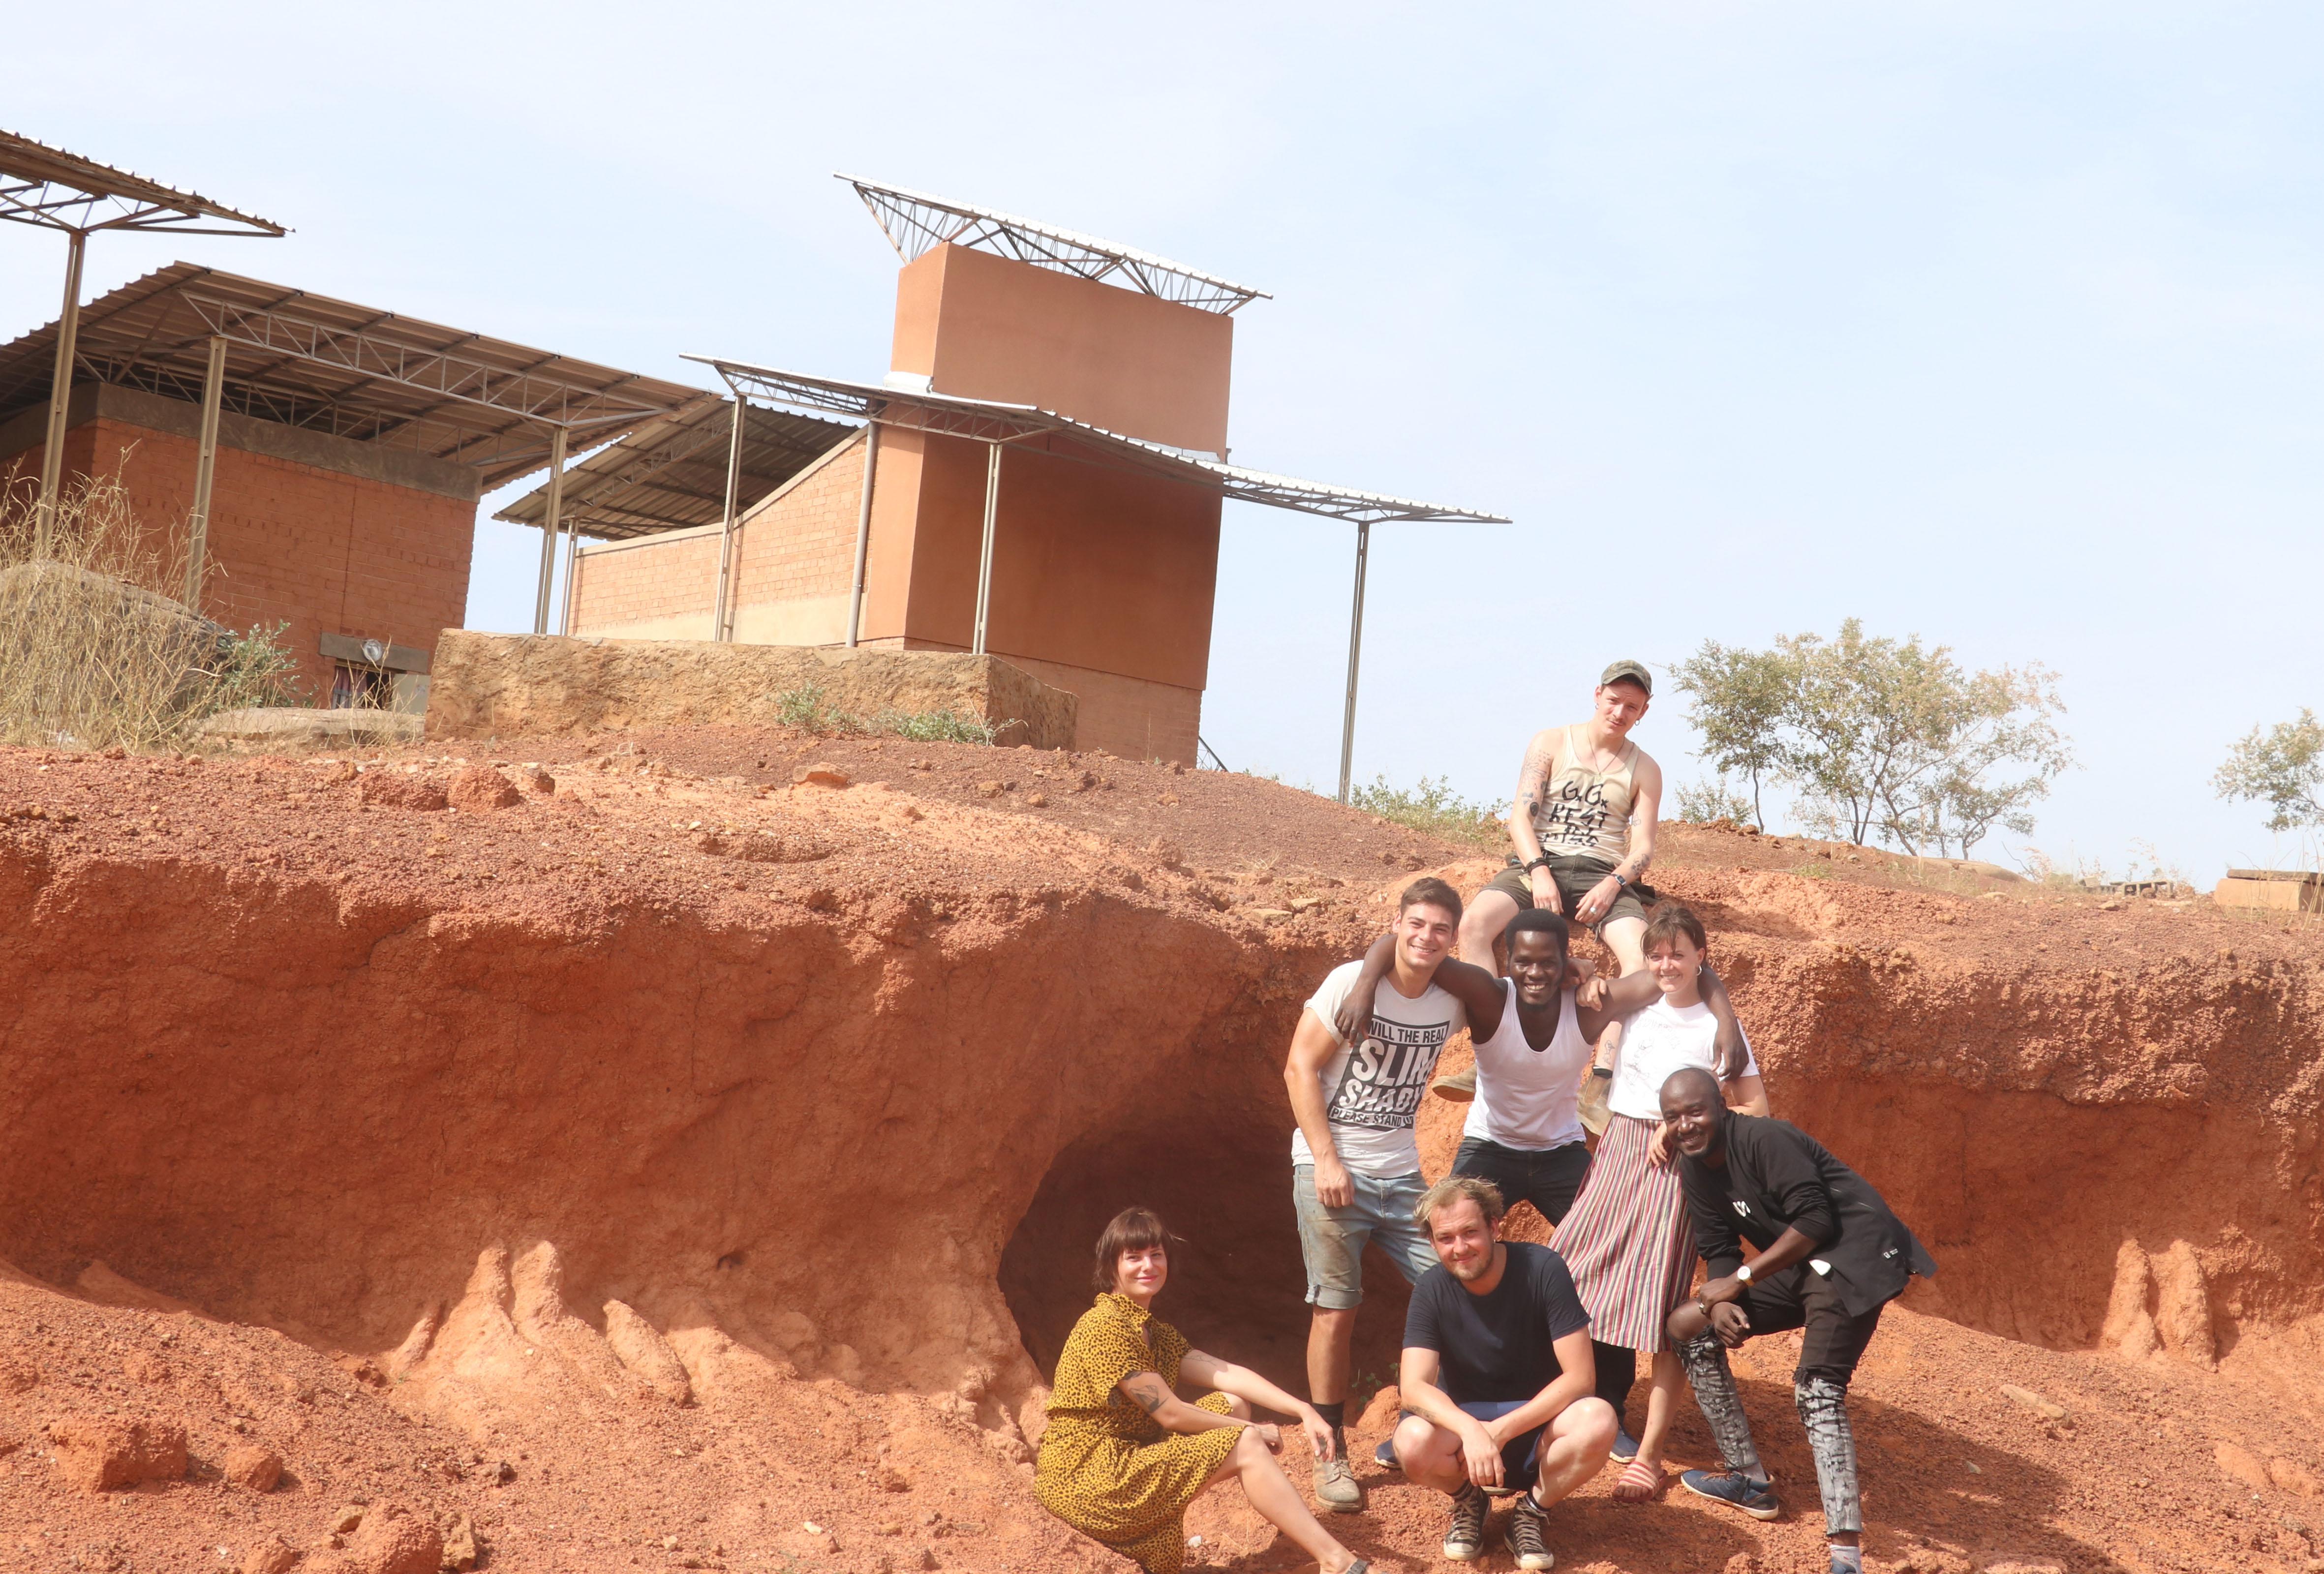 Fabian Hub, Hub, Village Opera, Operndorf Afrika, Yannick Riemer, Lisa Braun, Zonathan Dembele, Raphael Dembele, Raph B, Greta Wildhage, Magnus Krügere